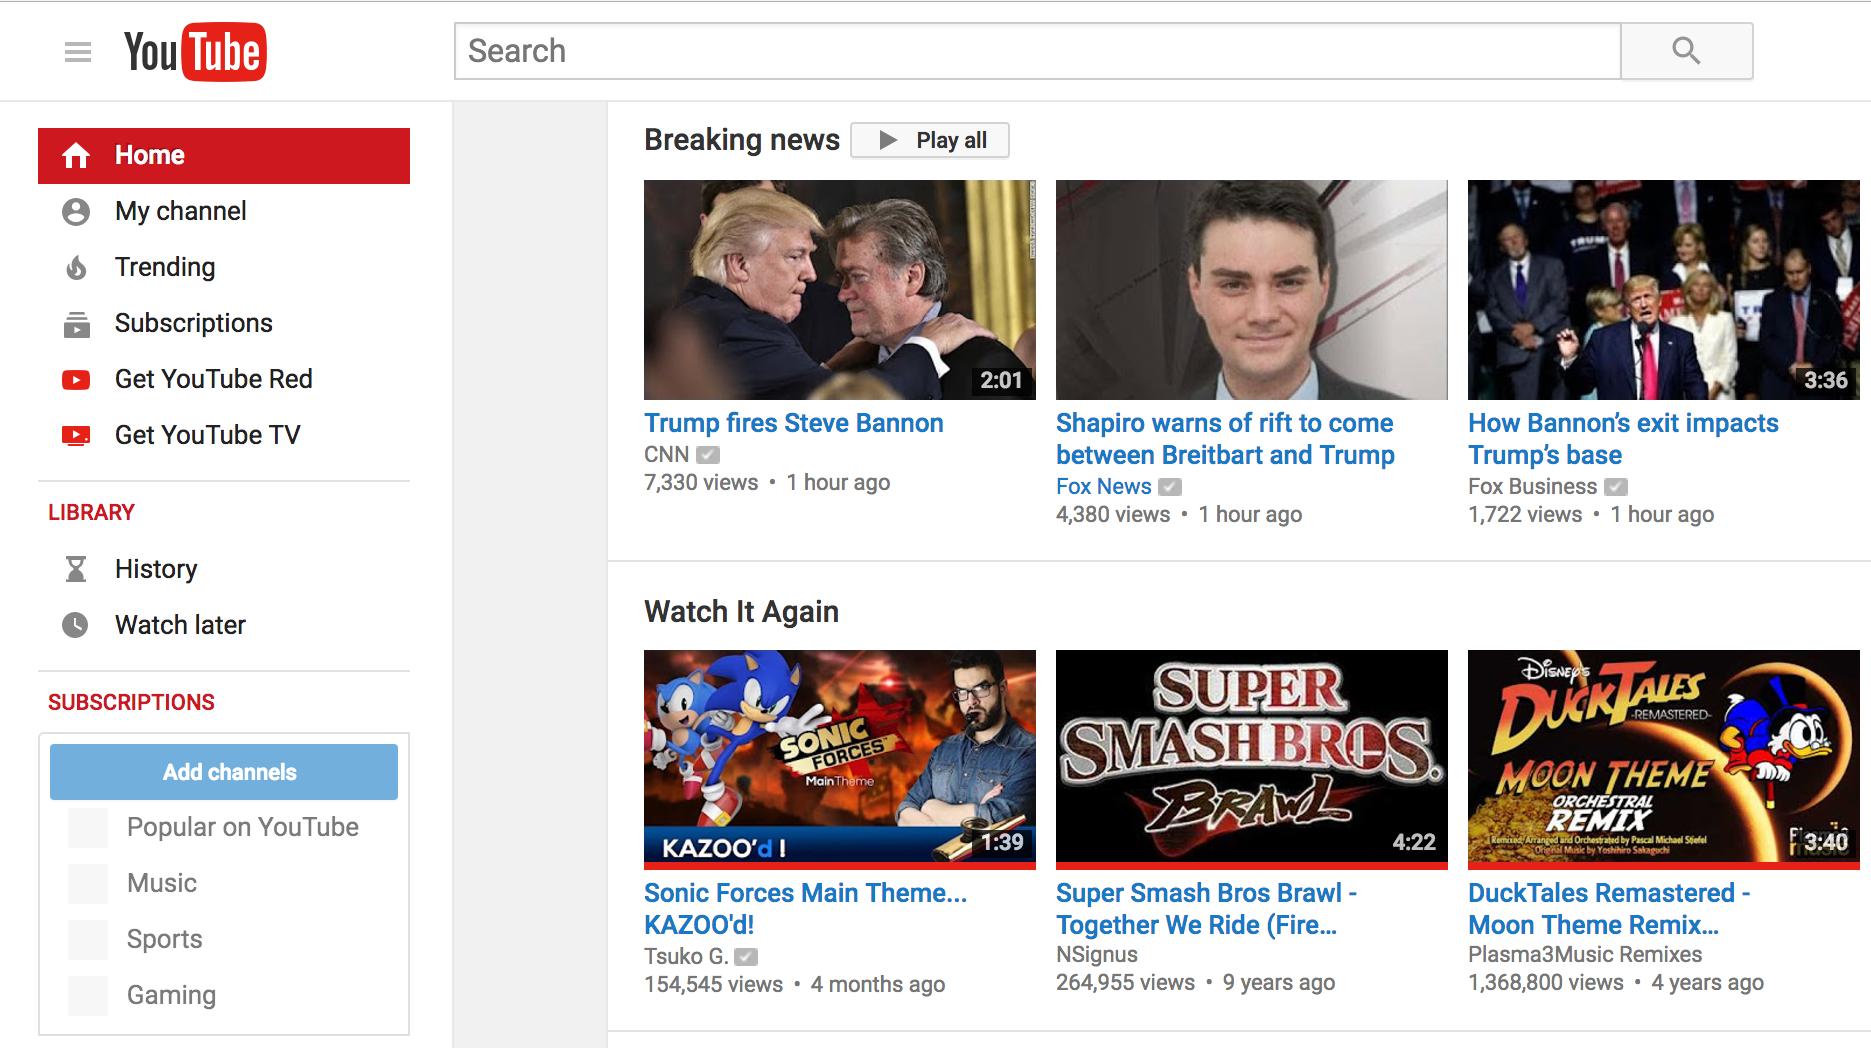 youtube sectiune importanta